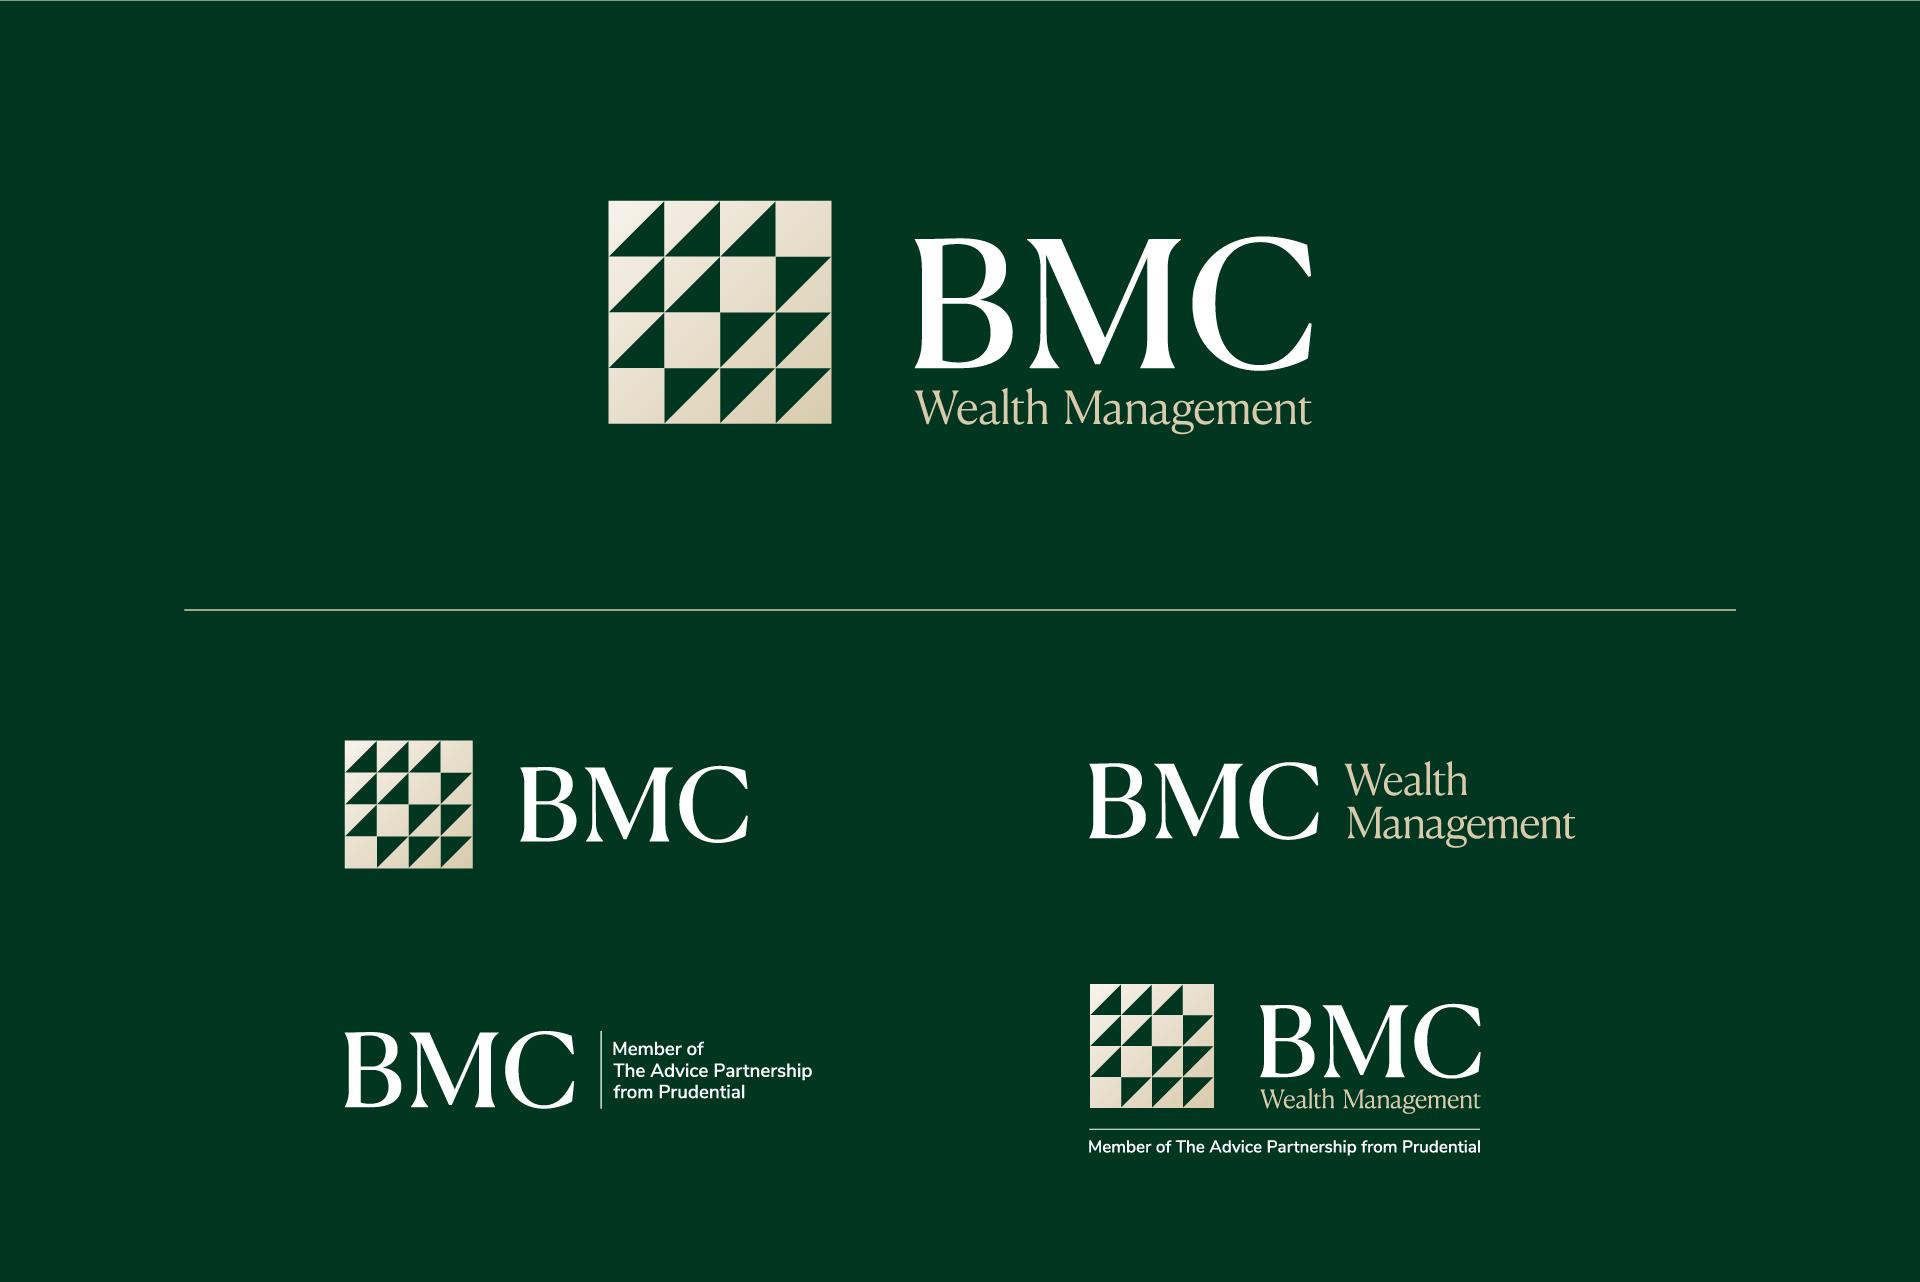 BMC Wealth Management brand identity logo system